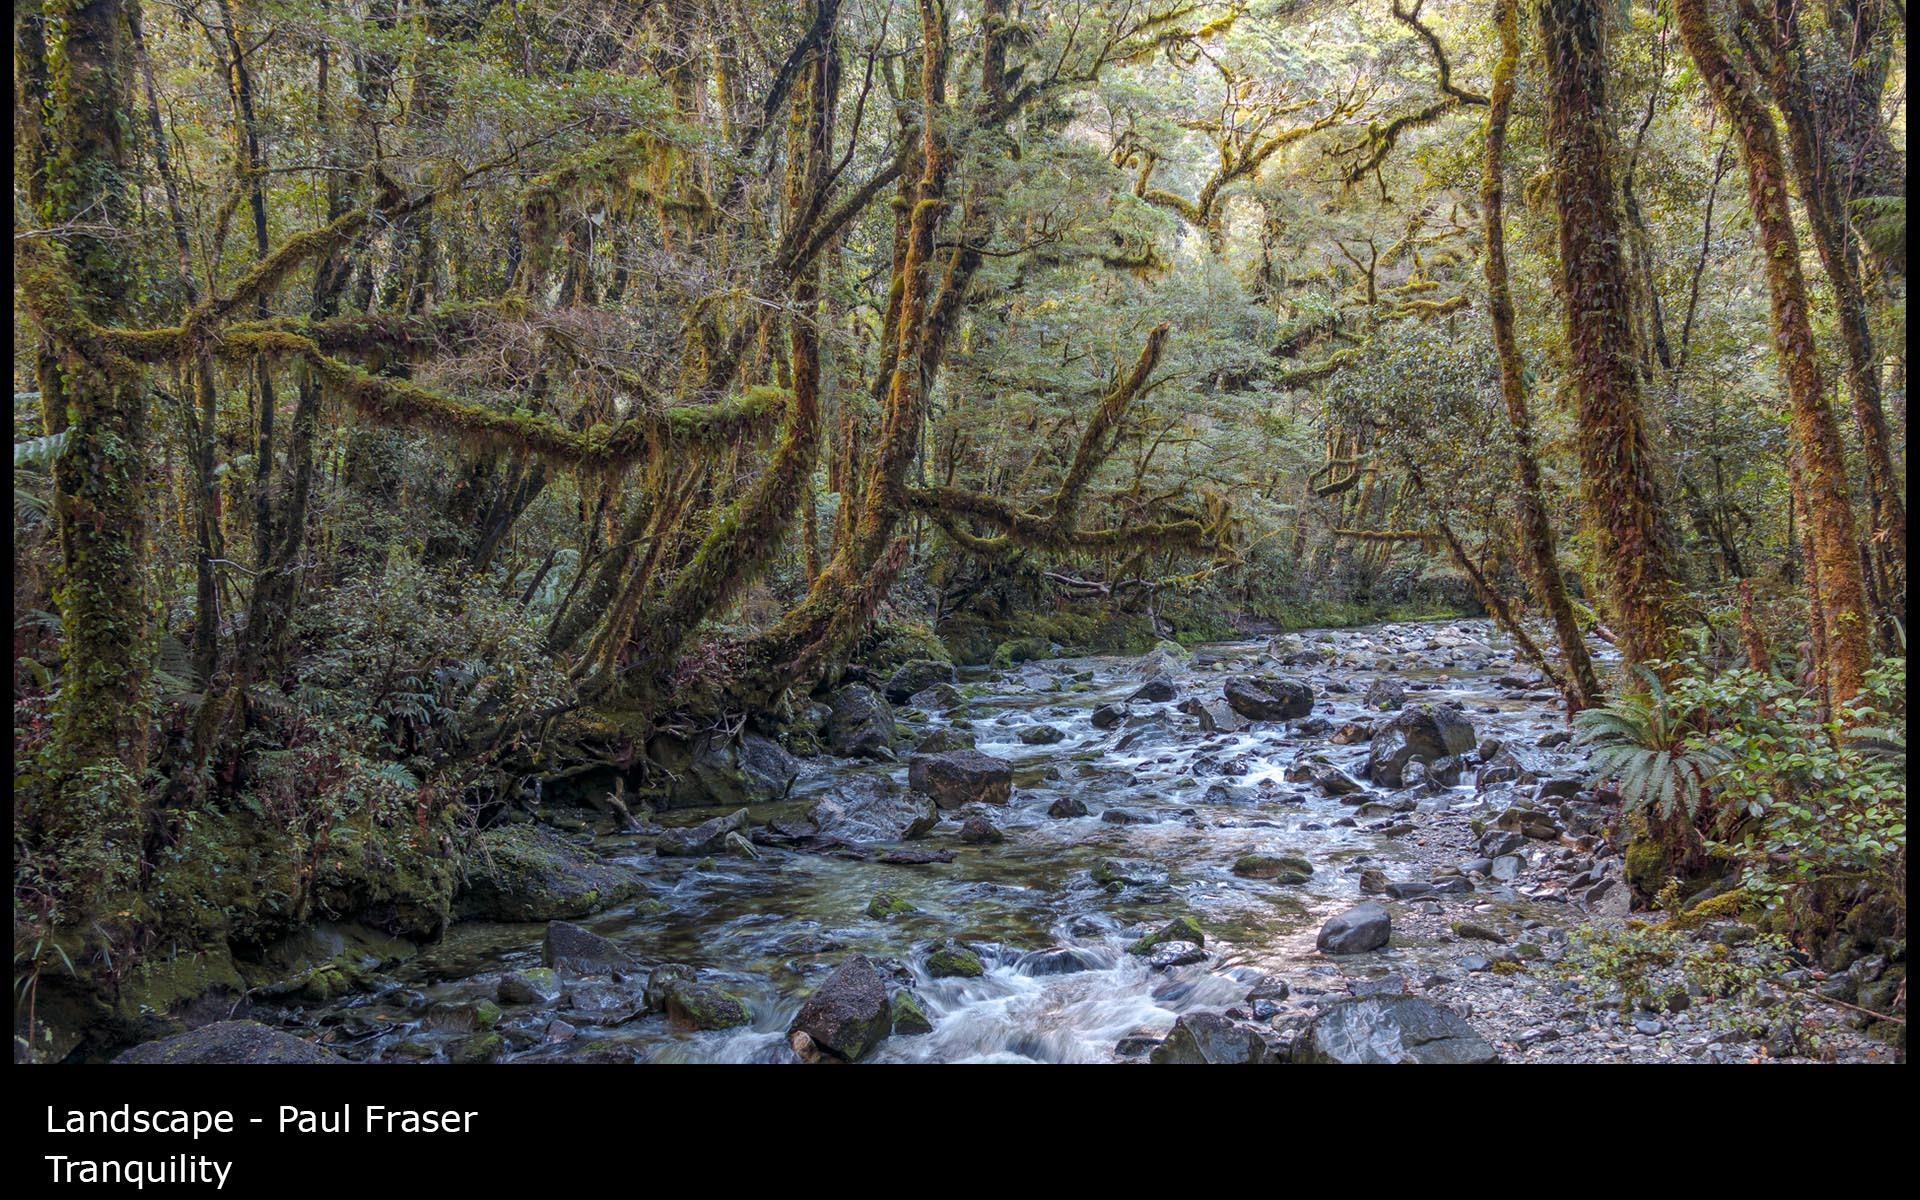 Tranquility - Paul Fraser